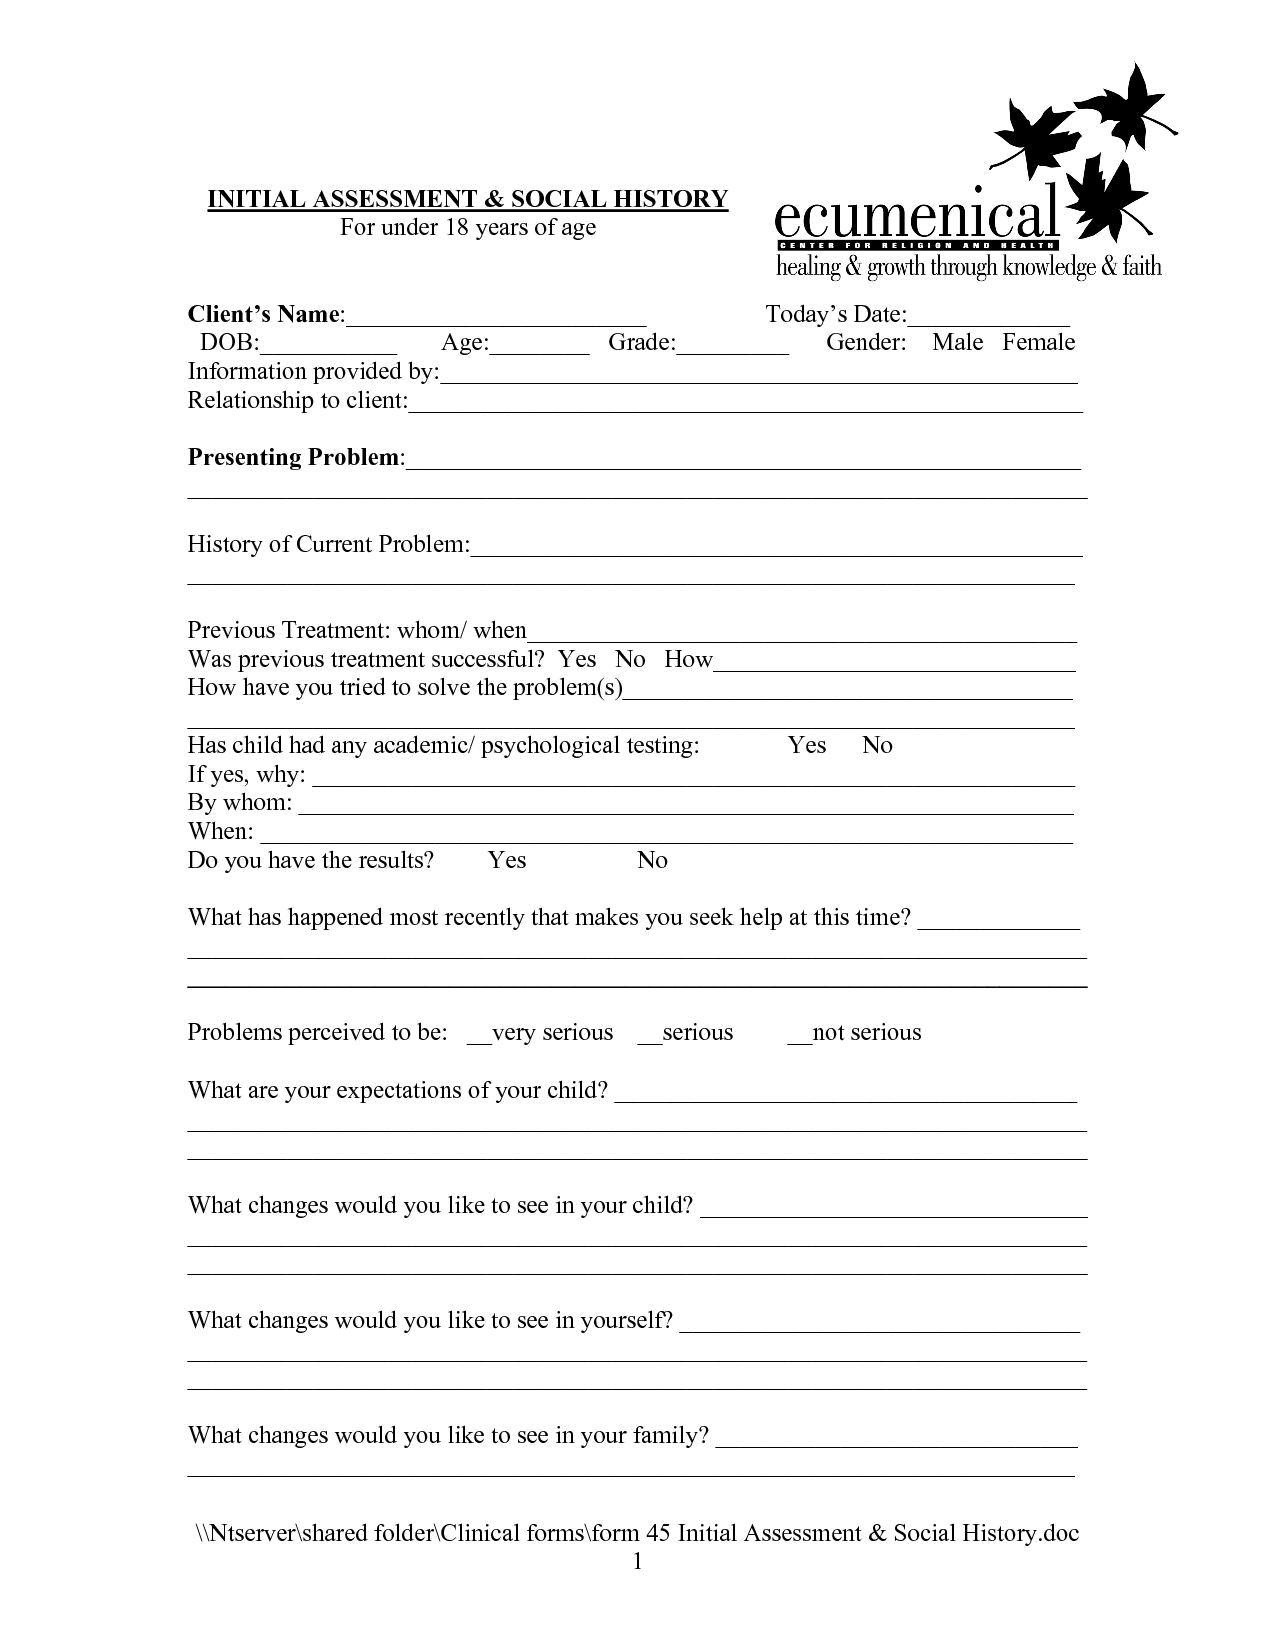 Social Work Intake Form Template